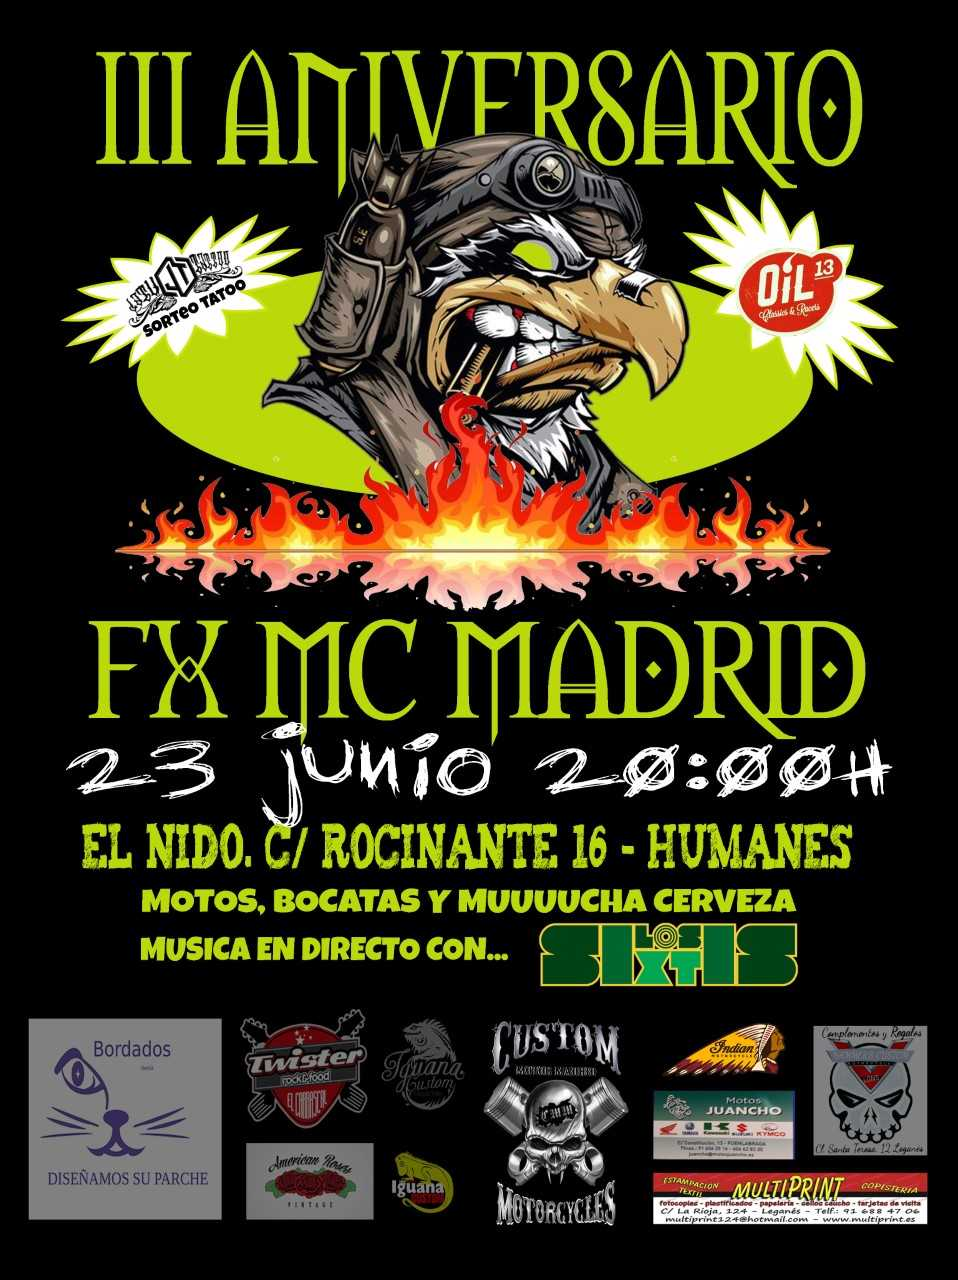 Oil13 - FX MC Madrid 2018 - 3º Aniversario